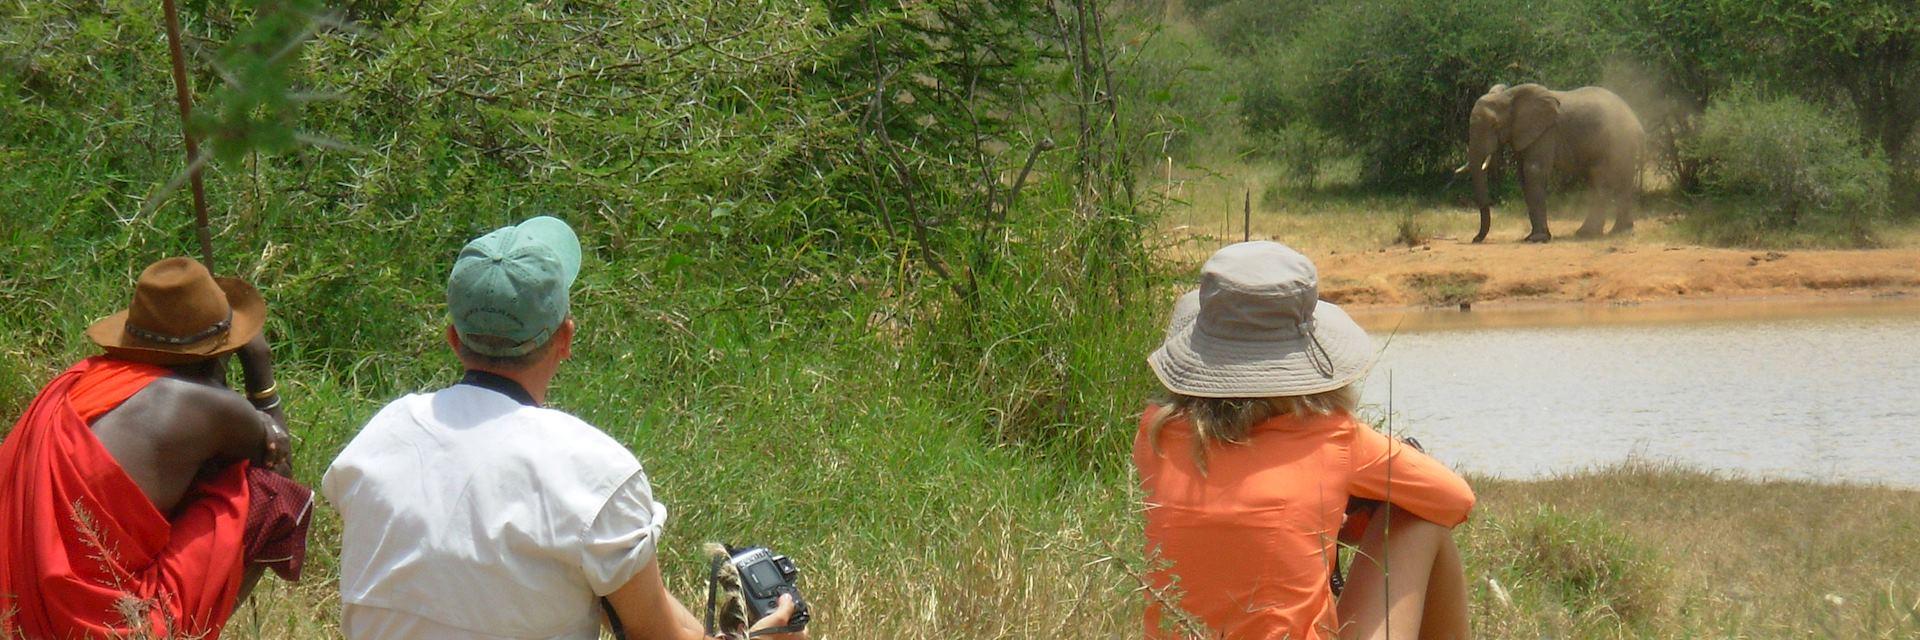 Walking safari in Karisia Hills